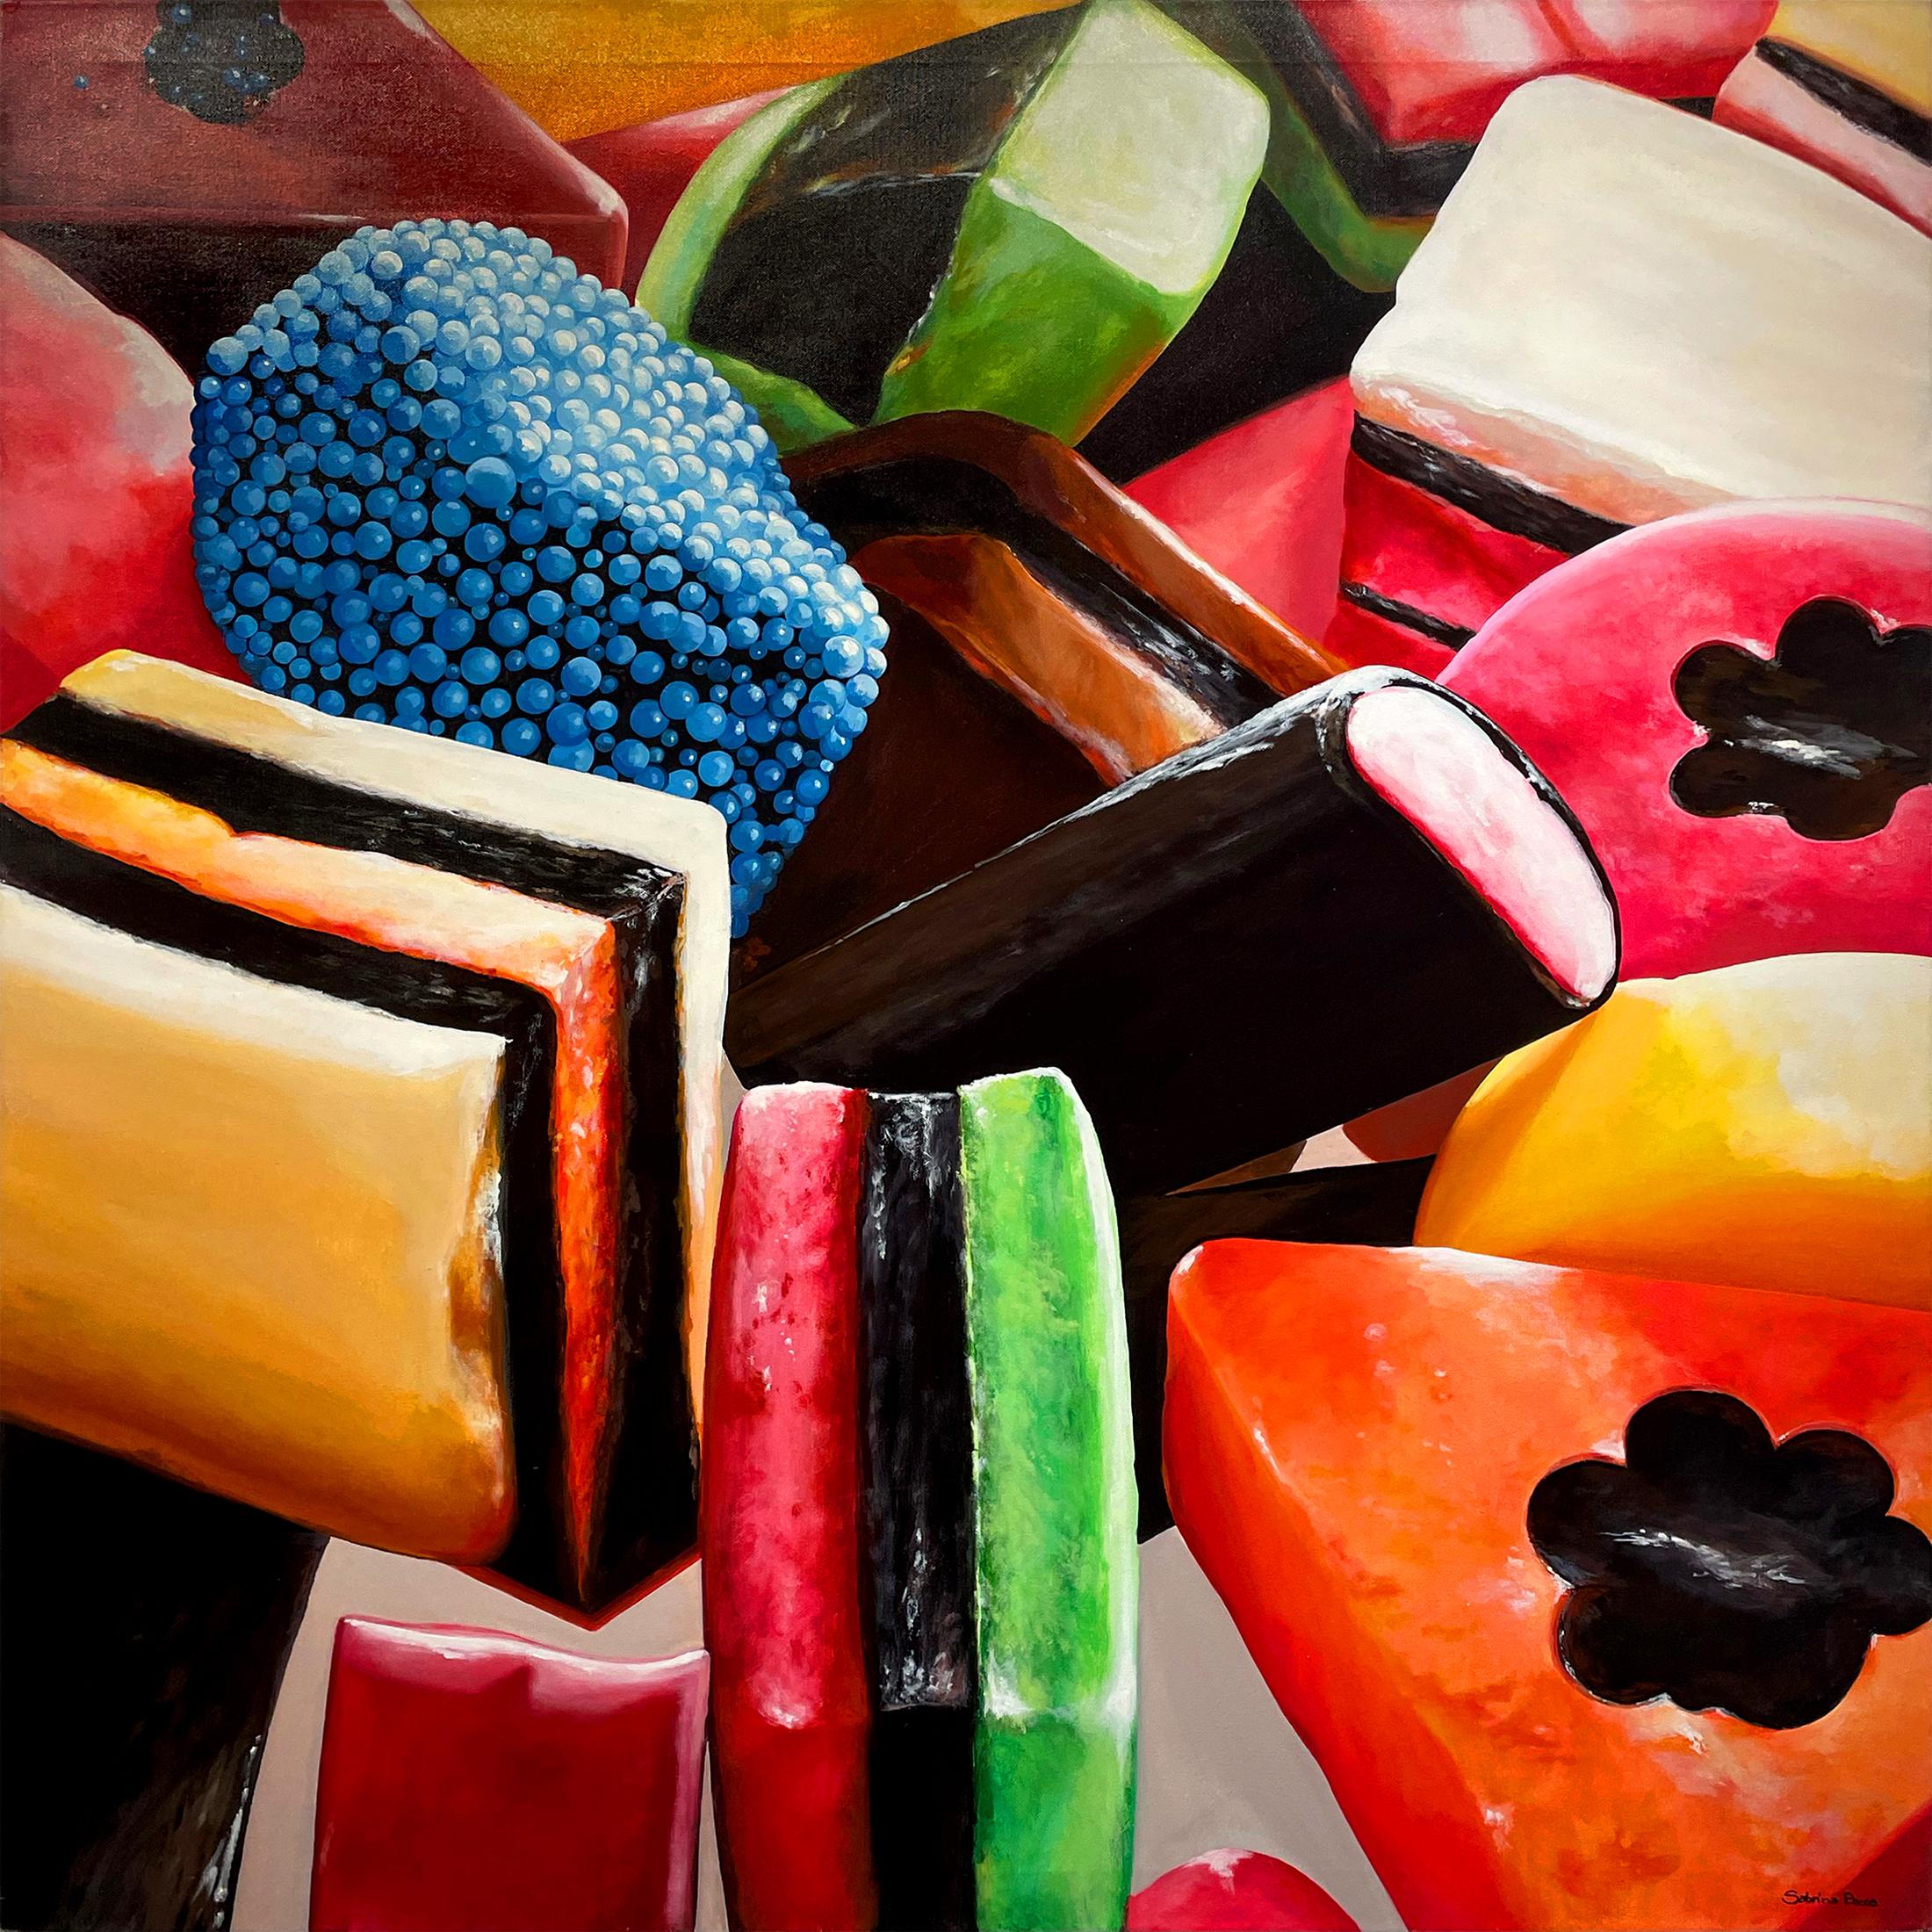 Sabrina Rocca - Coloured Candies , 7056-006-019